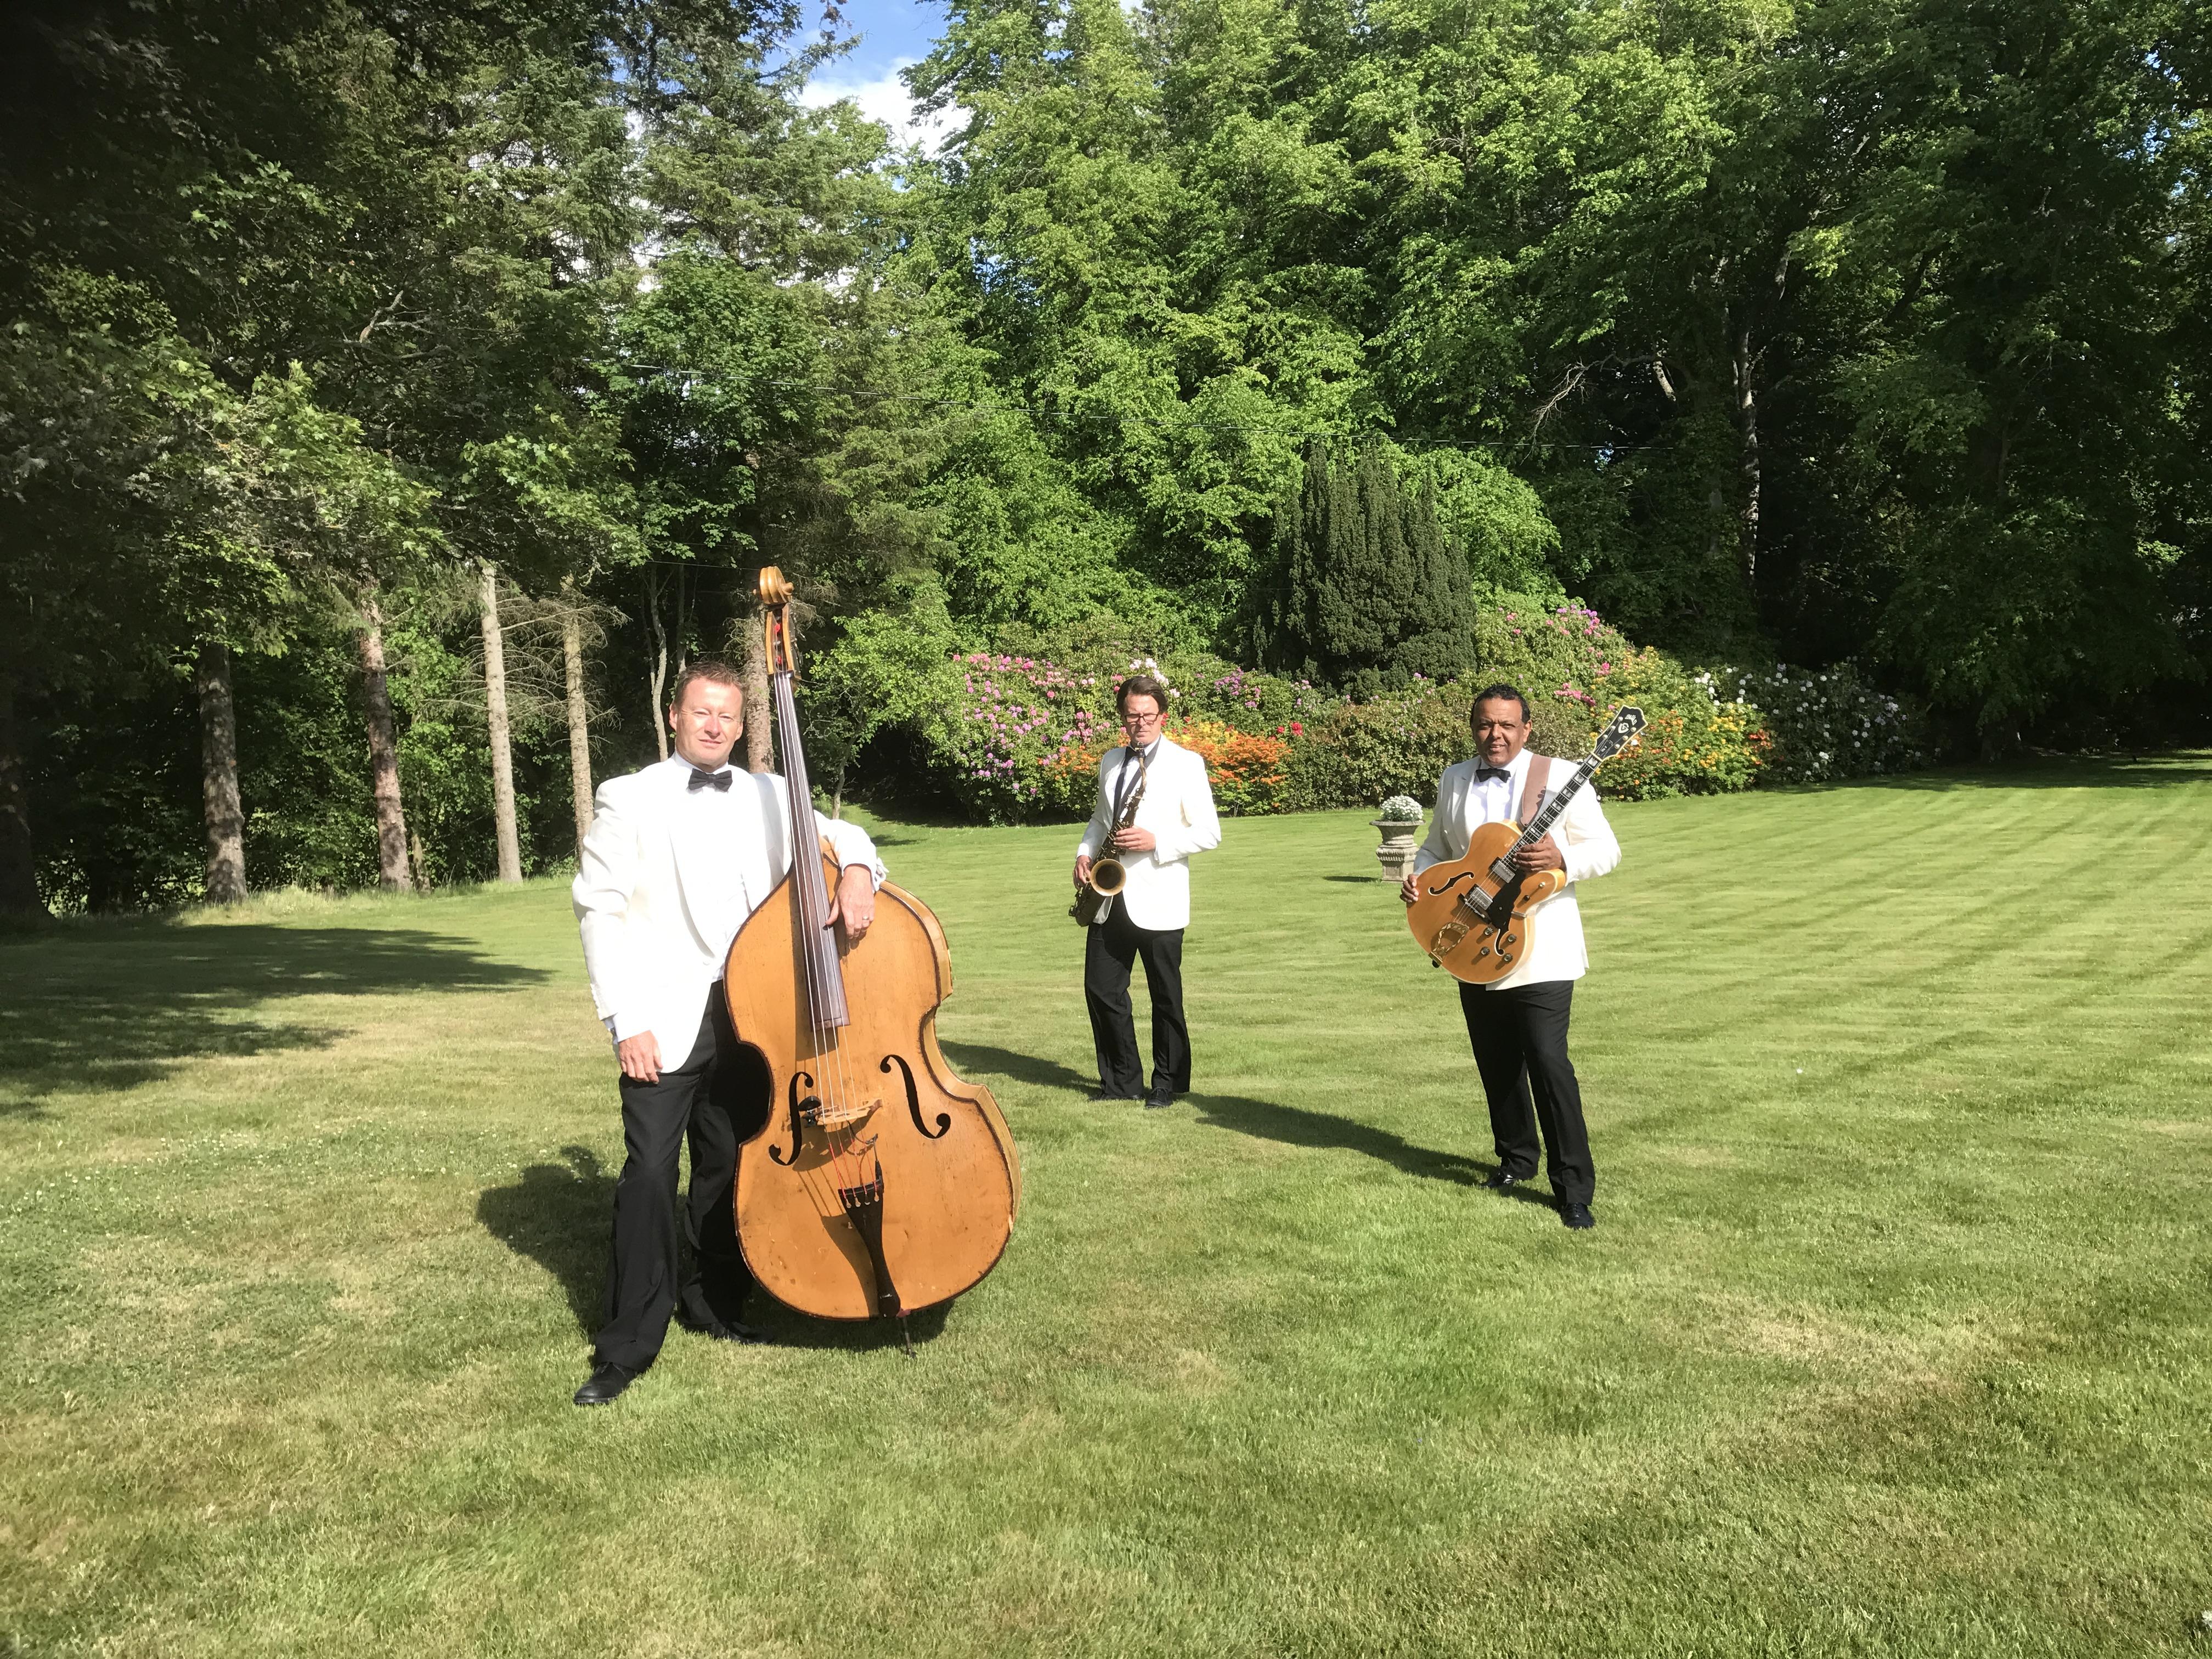 ritz trio, glencorse wedding band, jazz band edinburgh,